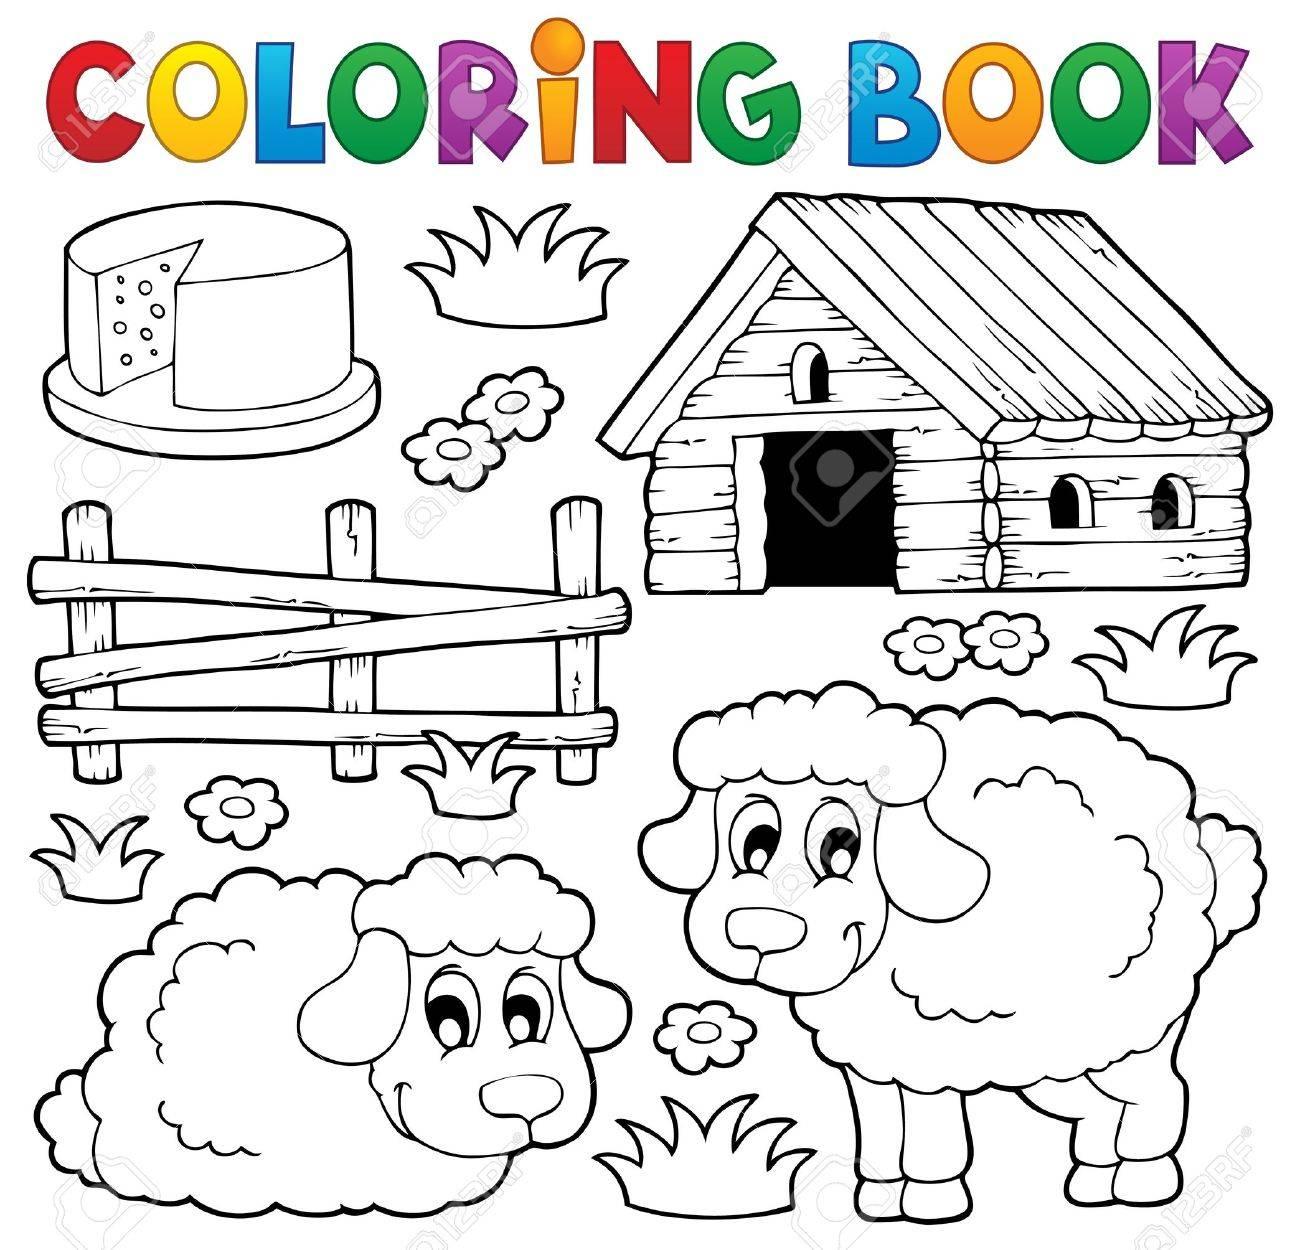 Coloring book sheep theme 1 - eps10 vector illustration Stock Vector - 22867096